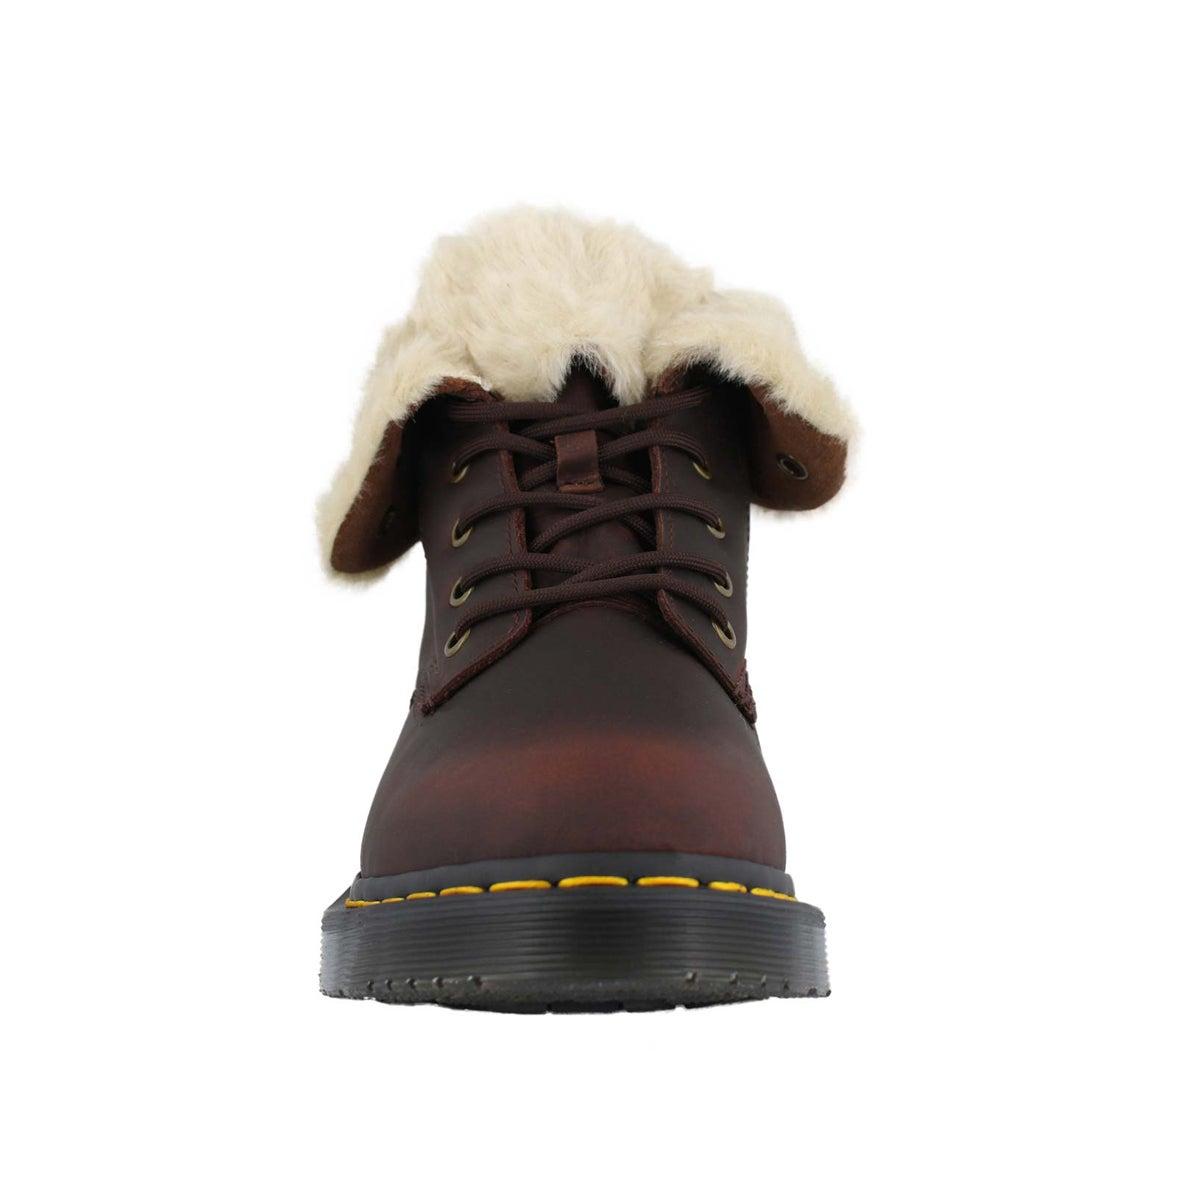 Lds 1460 Kolbert Snowplow brn wtpf boot